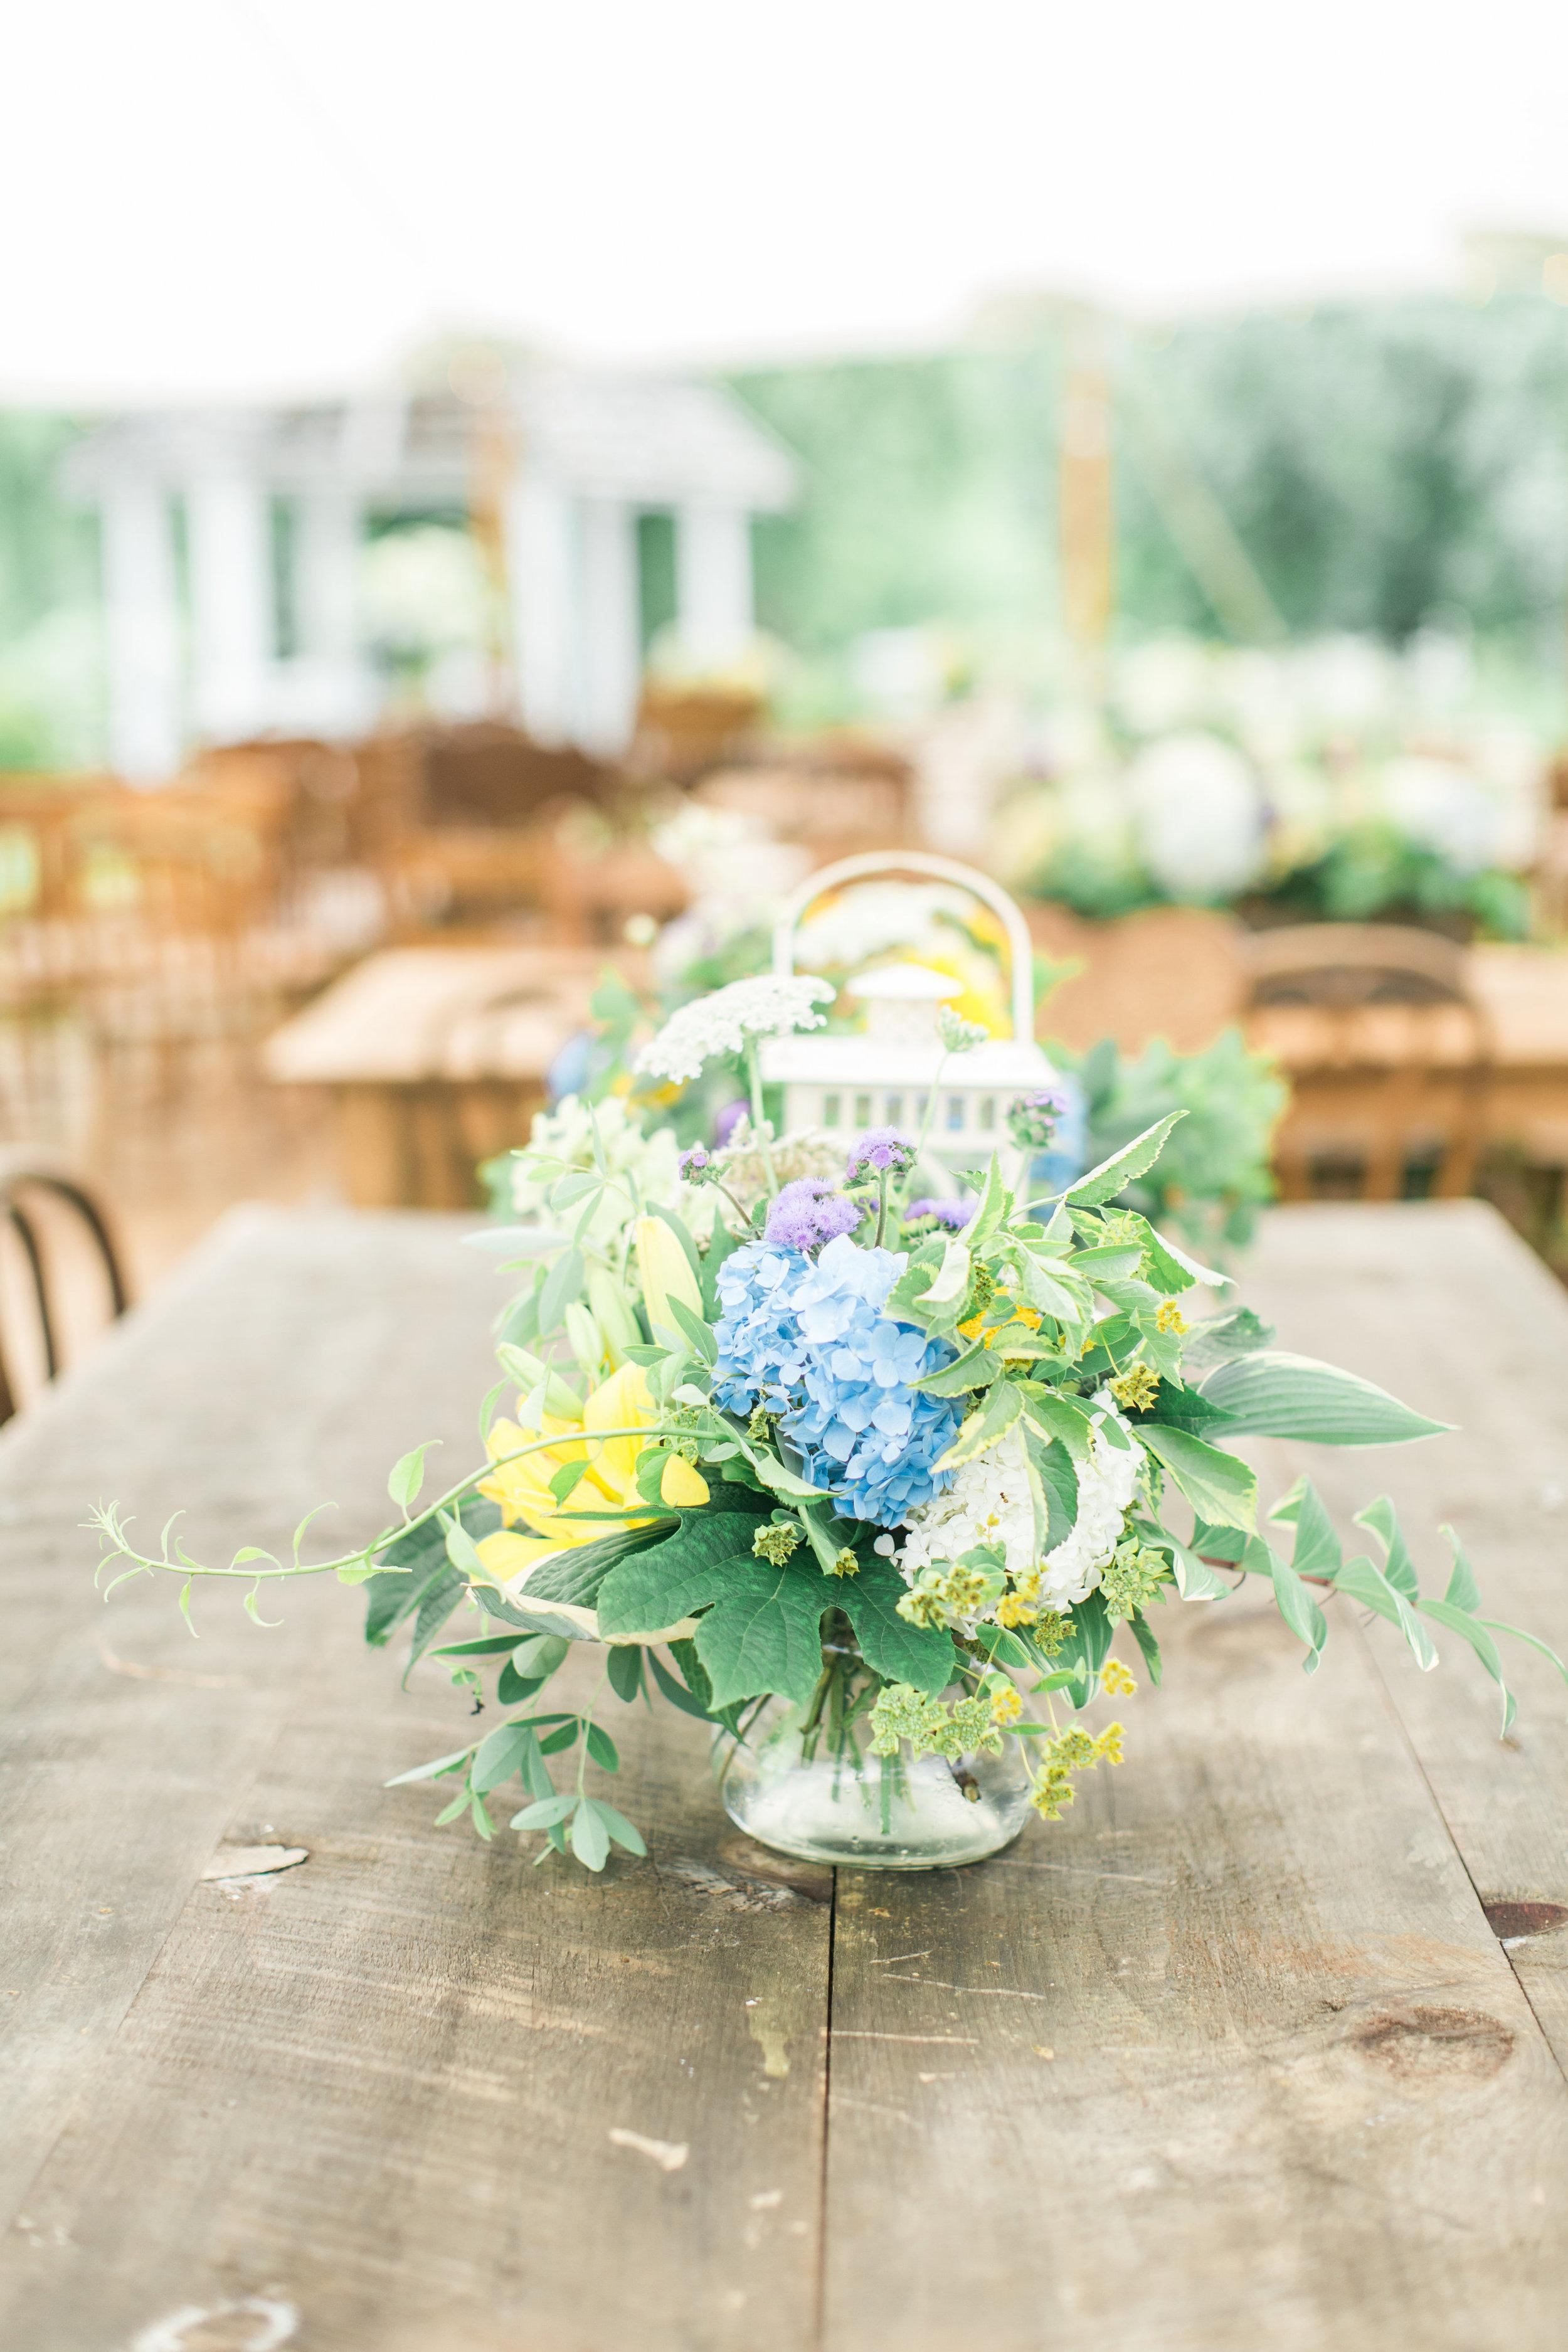 062715-Hannah+Drew-pharsalia-wedding-kathryn-ivy-photography-151.jpg